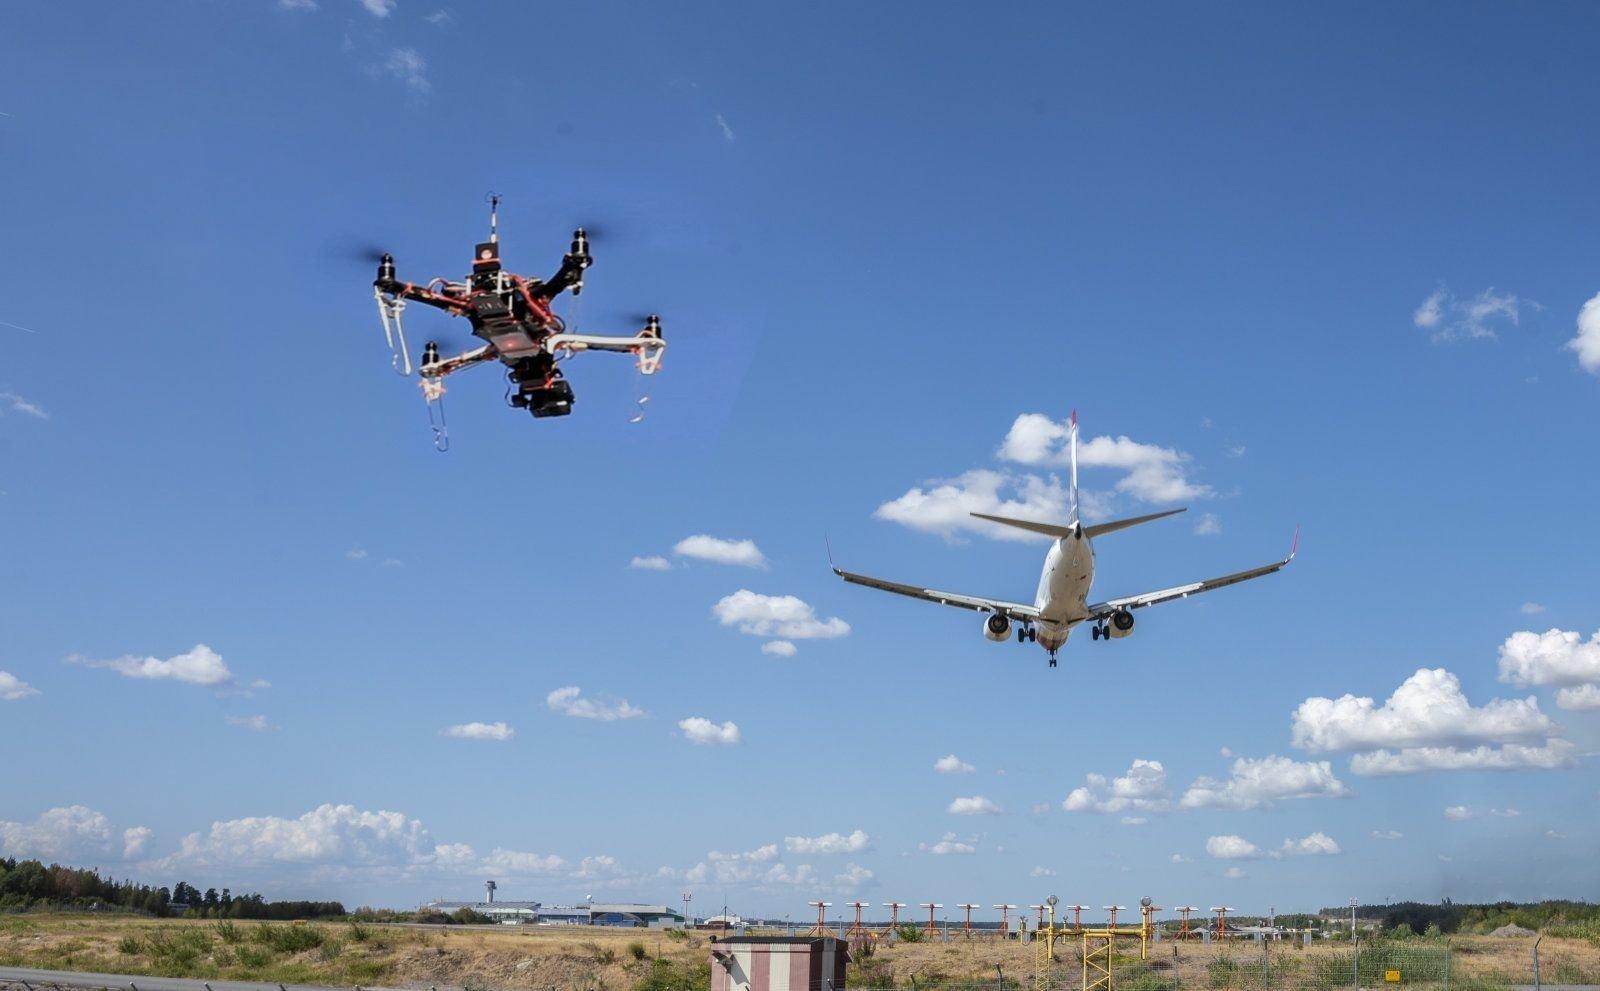 faa drone airport 2 آمریکا ۱۰ فناوری شناسایی و رهگیری پهپاد را در فرودگاهها آزمایش میکند اخبار IT